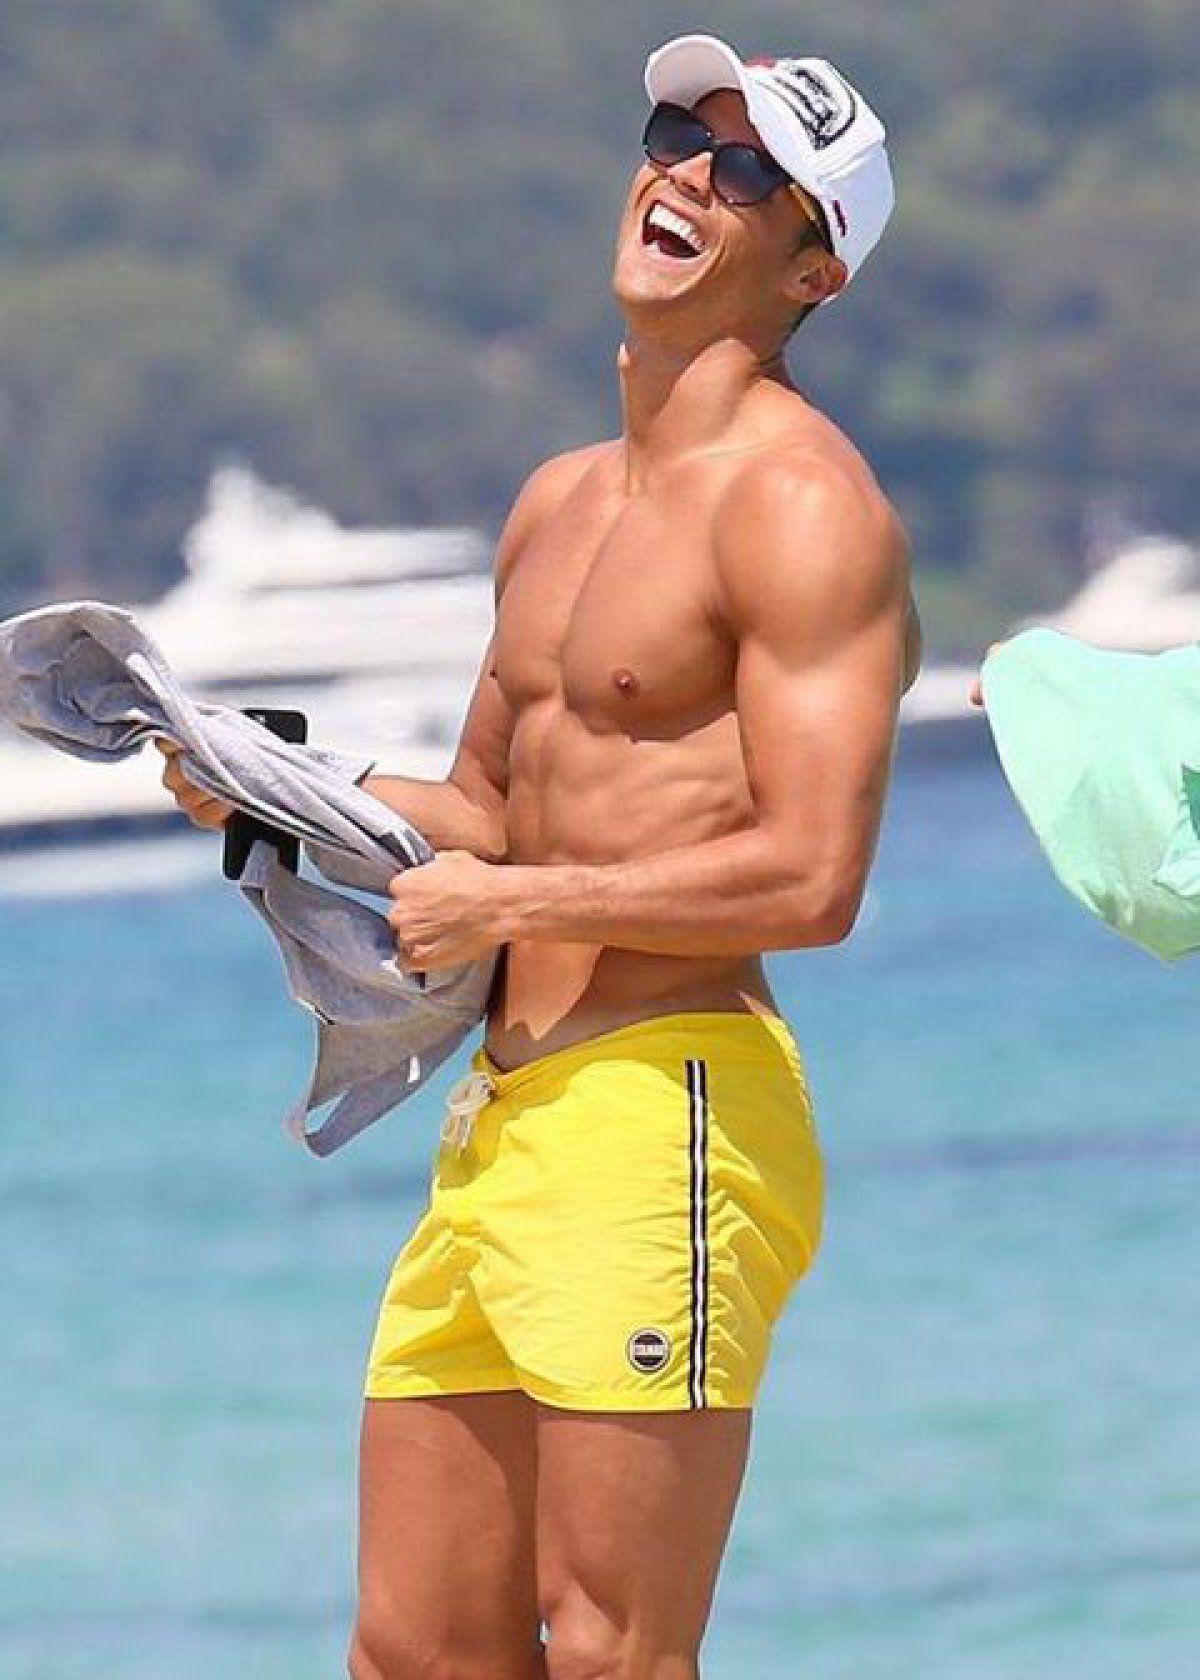 Its better than Tinder! | Cristiano ronaldo shirtless